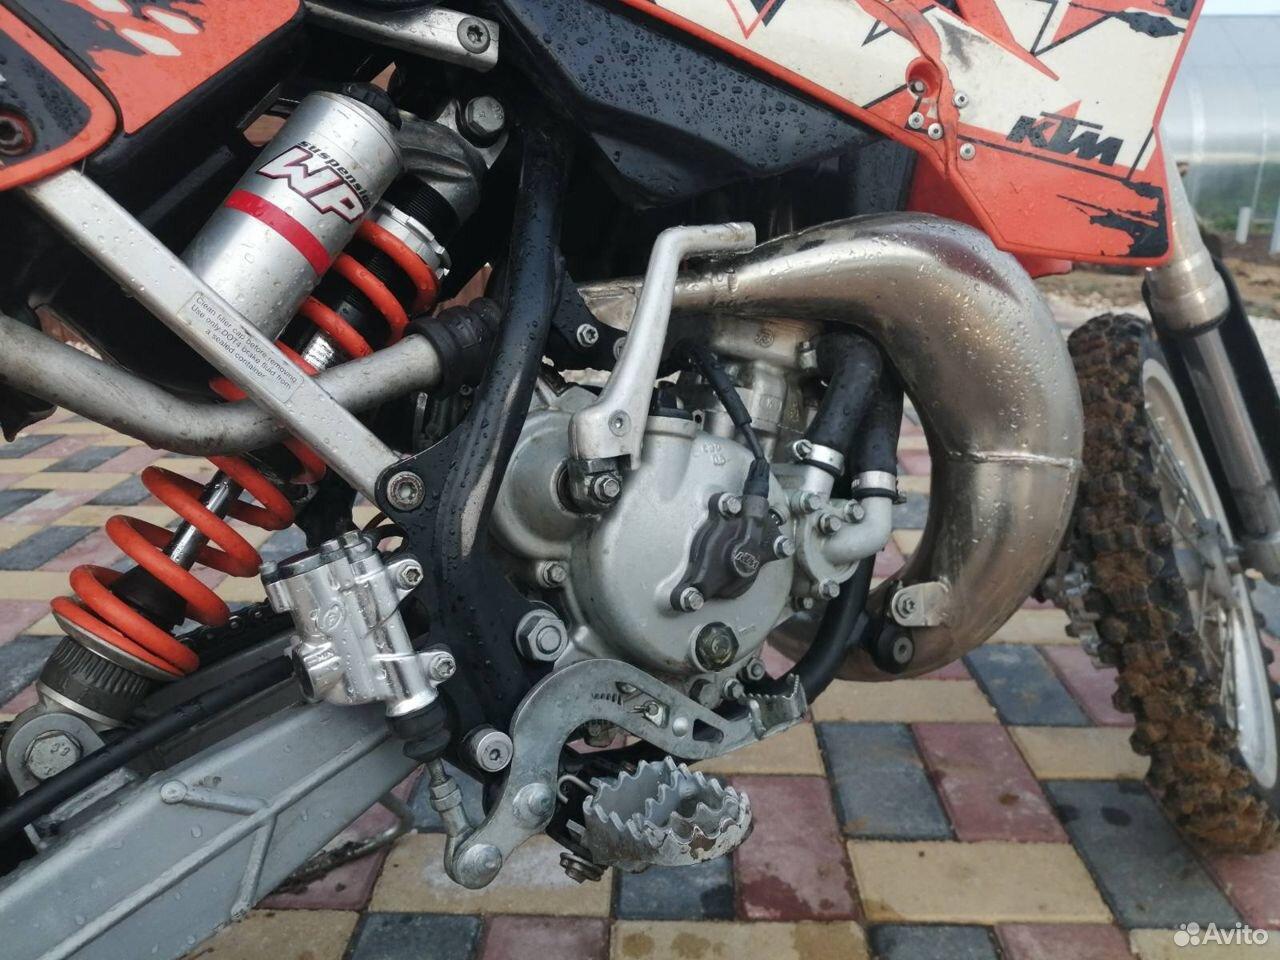 Мотоцикл KTM 65 sx  89190119599 купить 3